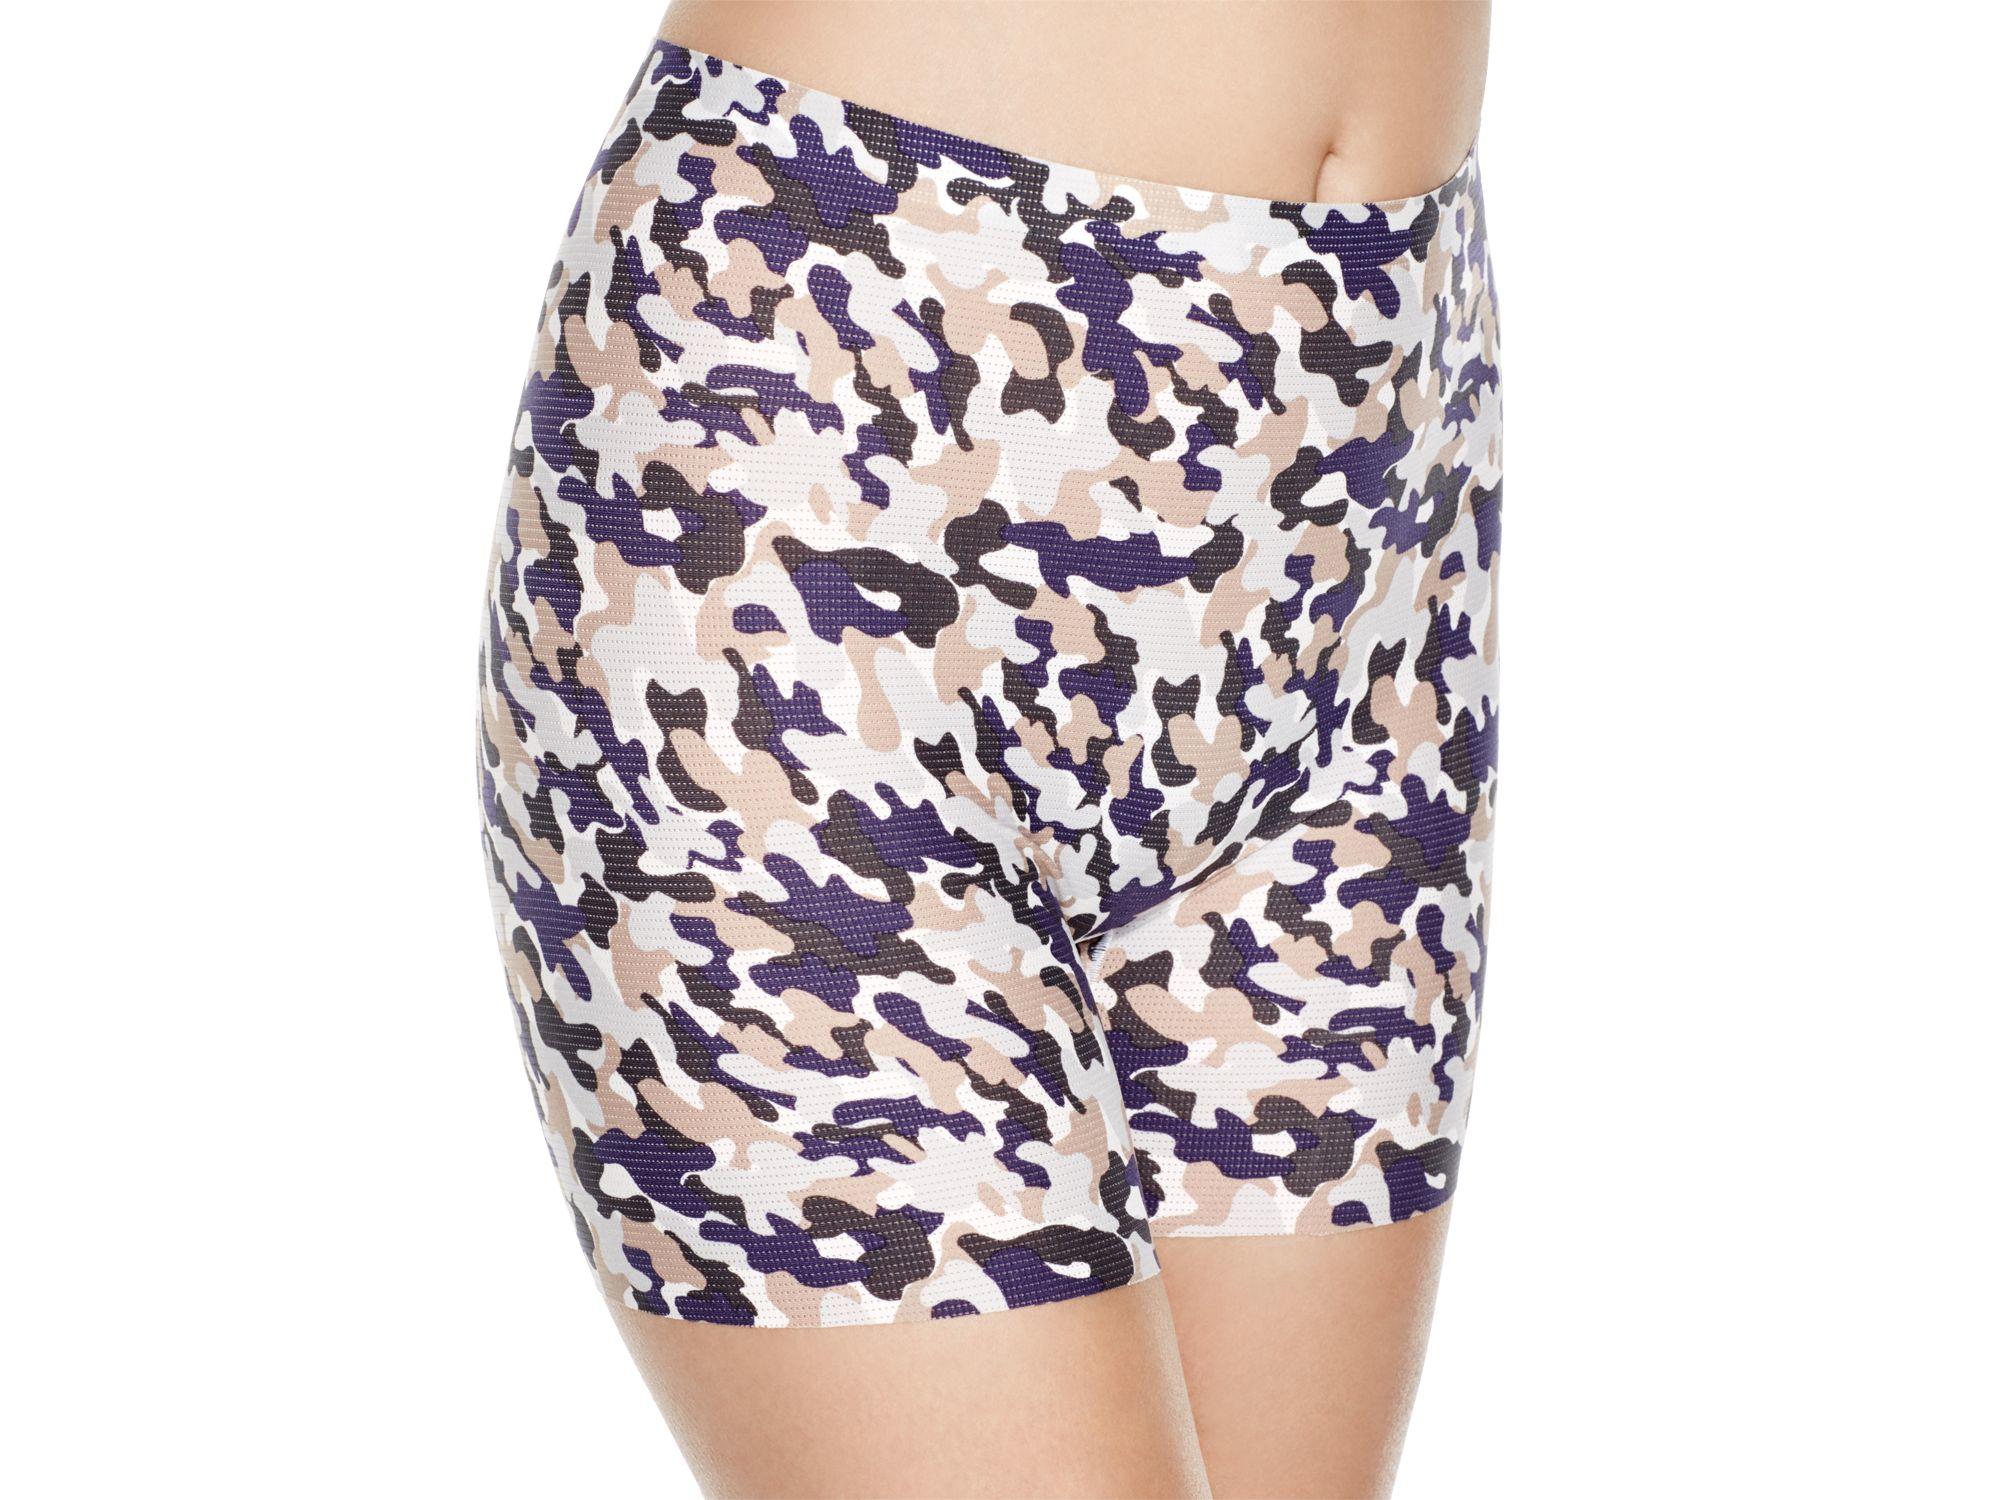 71479acaf09c4 Lyst - Spanx ® Perforated Shapewear Girl Shorts  10002r in Black